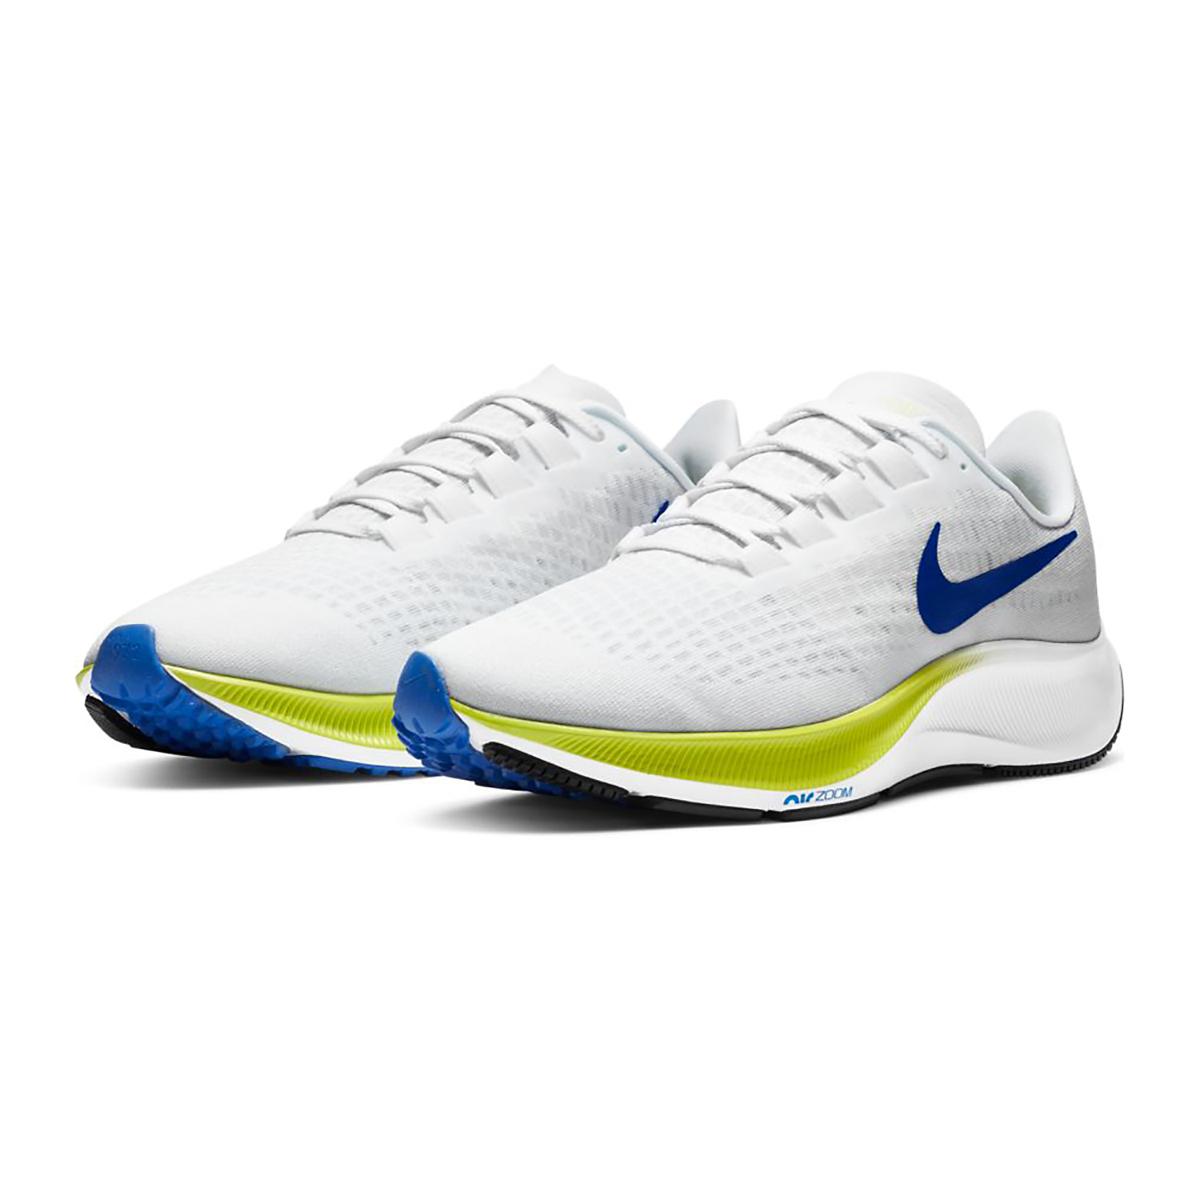 Men's Nike Air Zoom Pegasus 37 Running Shoe - Color: White/Racer Blue/Cyber/Black - Size: 6 - Width: Regular, White/Racer Blue/Cyber/Black, large, image 6